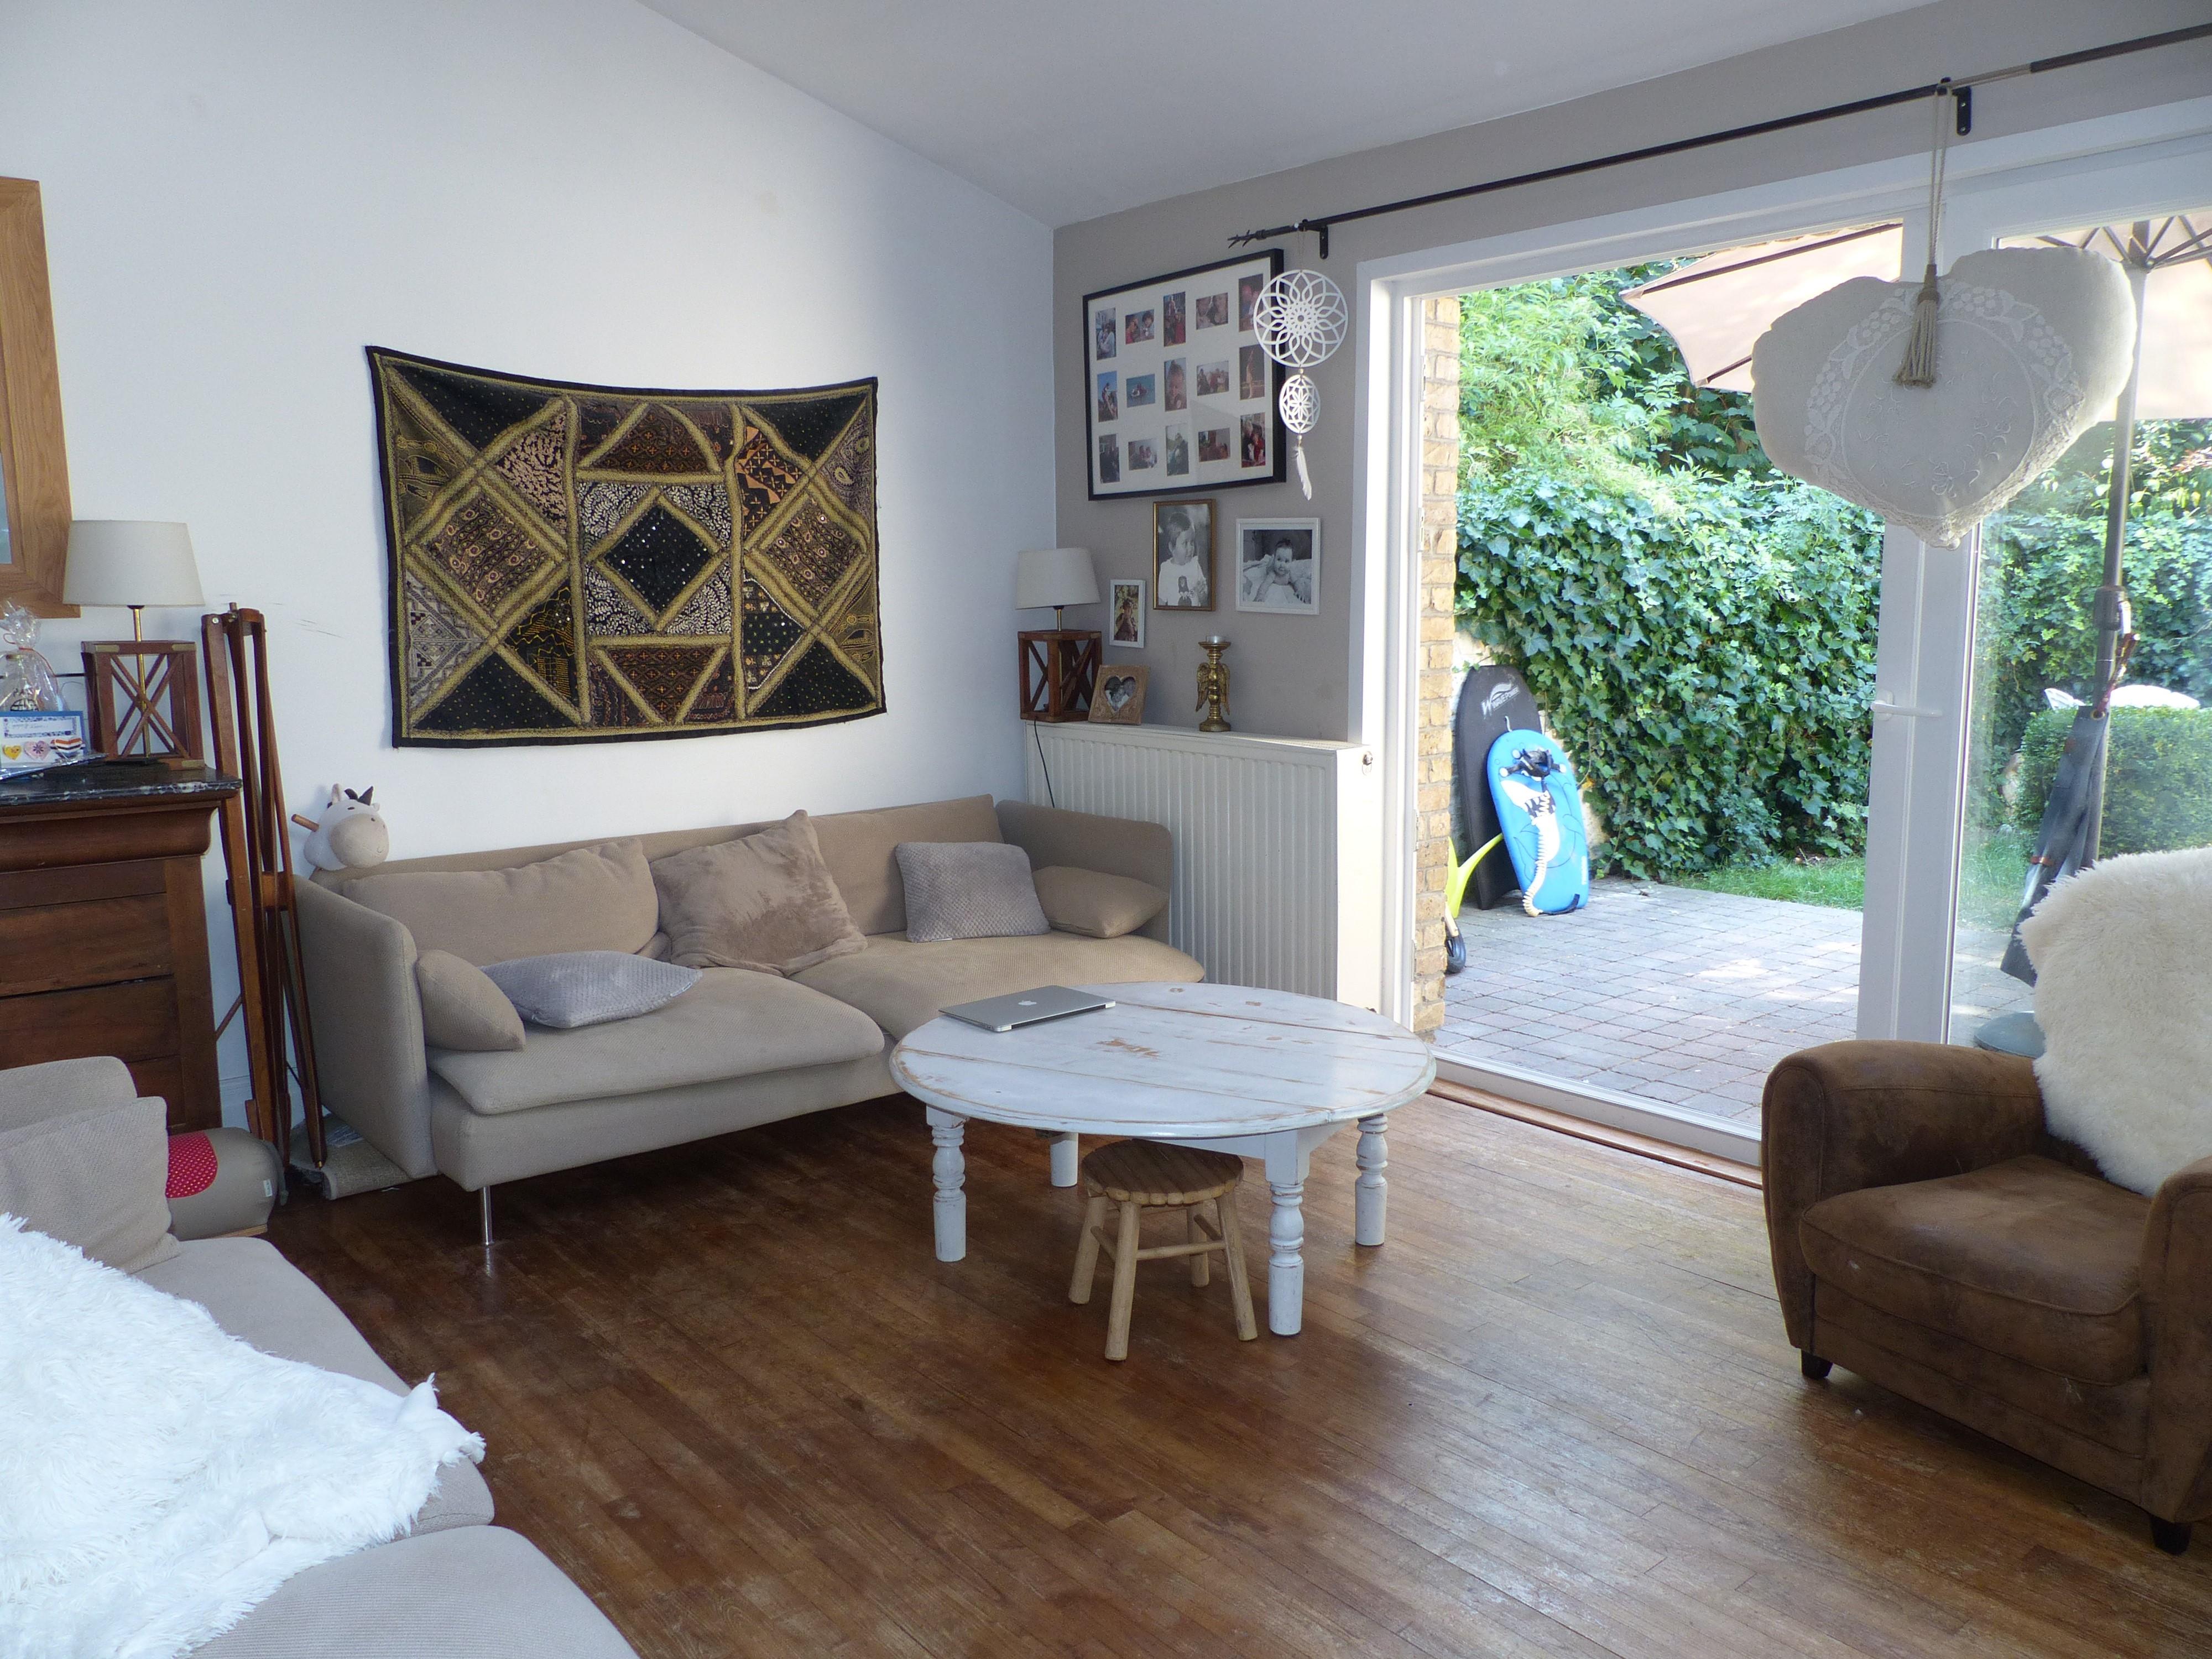 Rosendael Maison Malouine